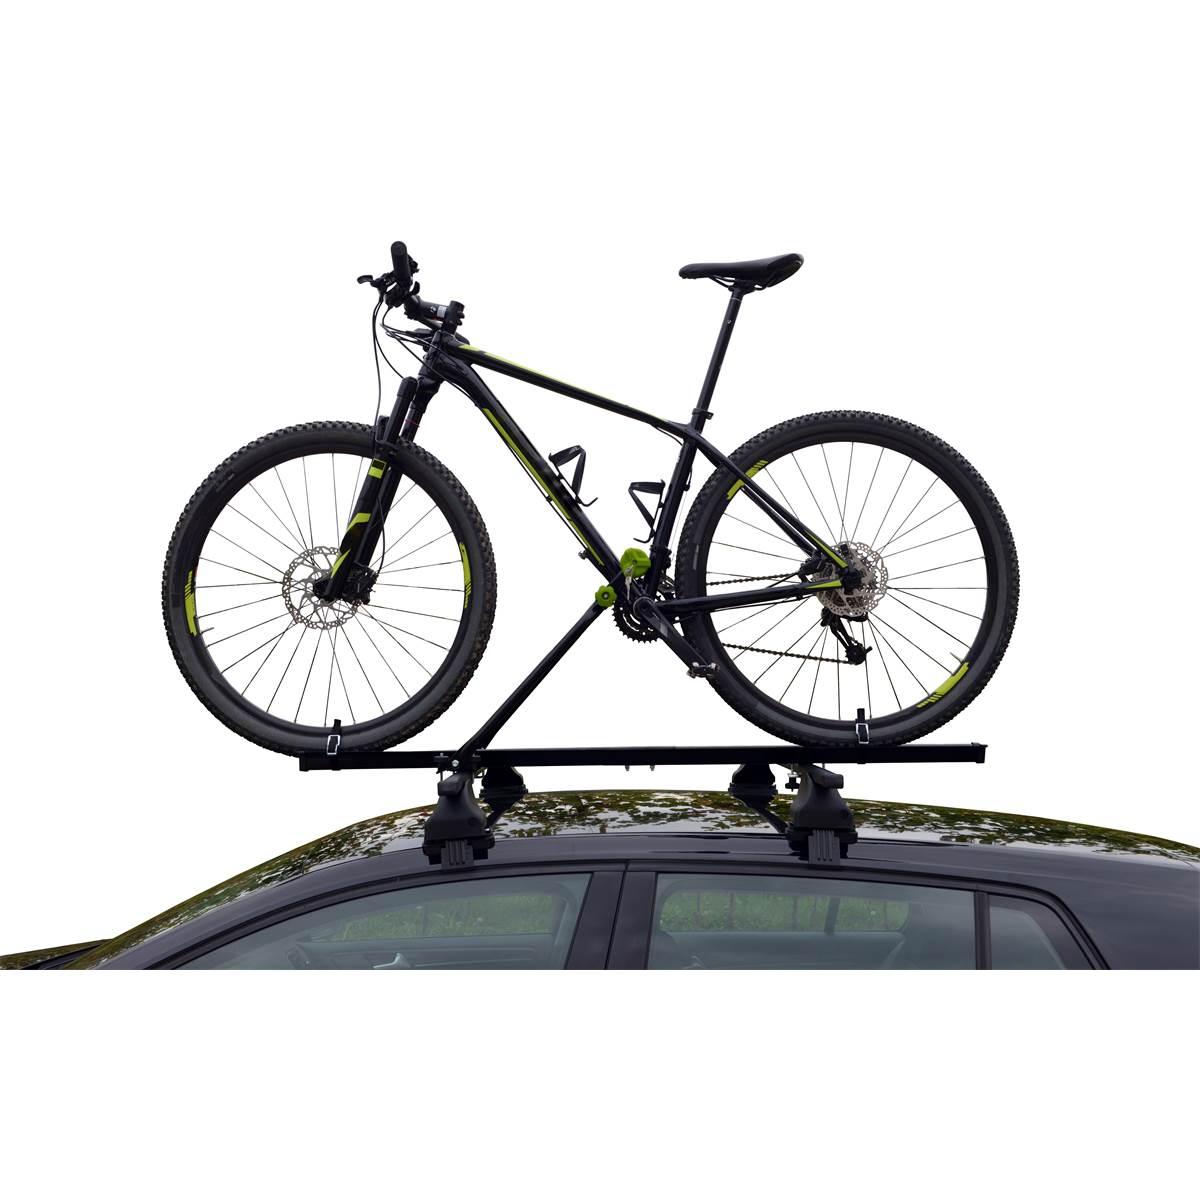 Porte-vélo barre de toit Feu Vert